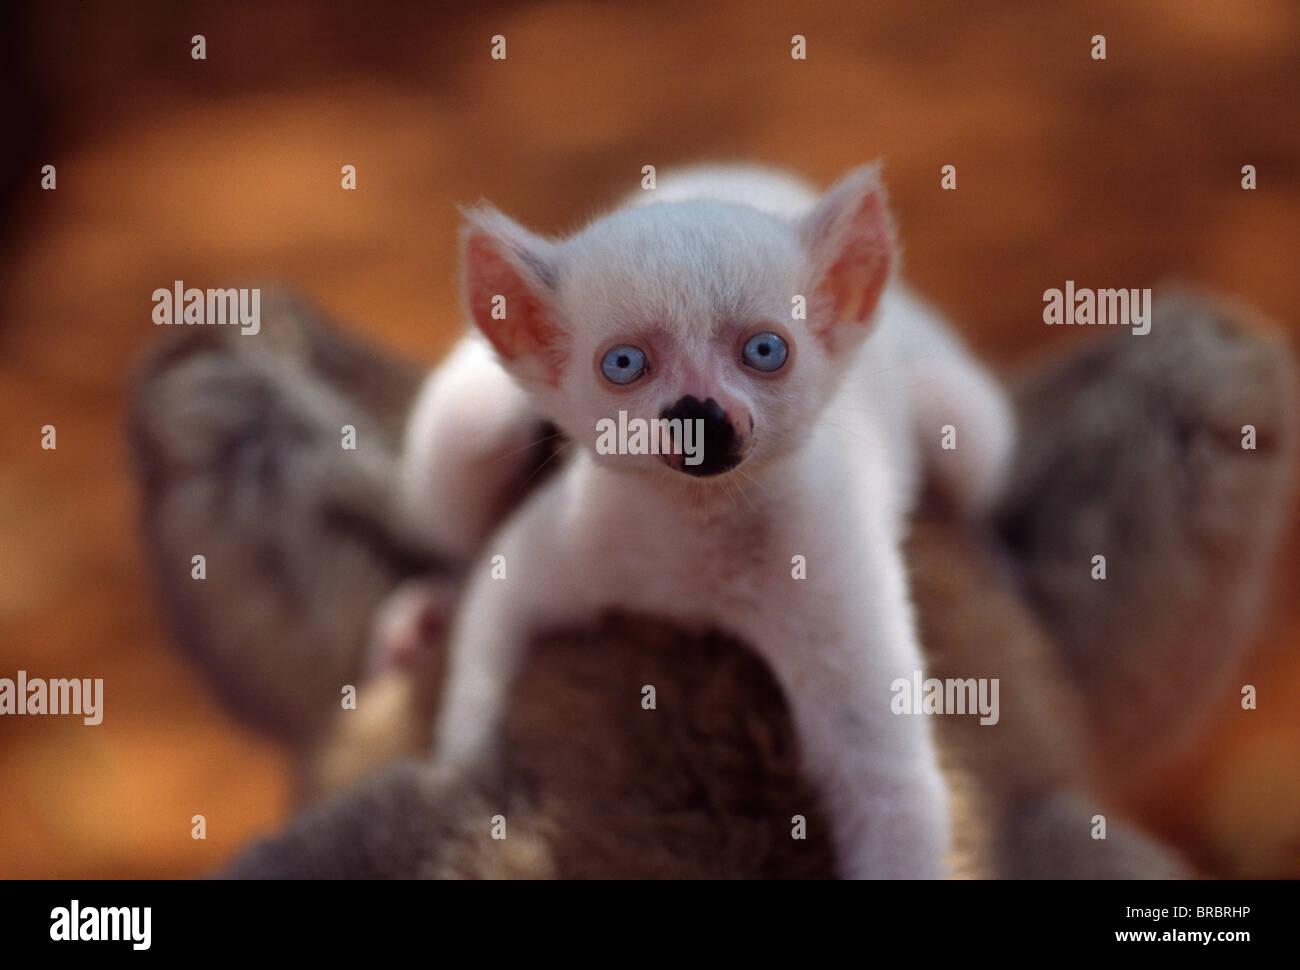 Lémur de cola anillada (Lemur catta), todo bebé blanco macho albino (zafiro) sobre la madre de la espalda, Imagen De Stock